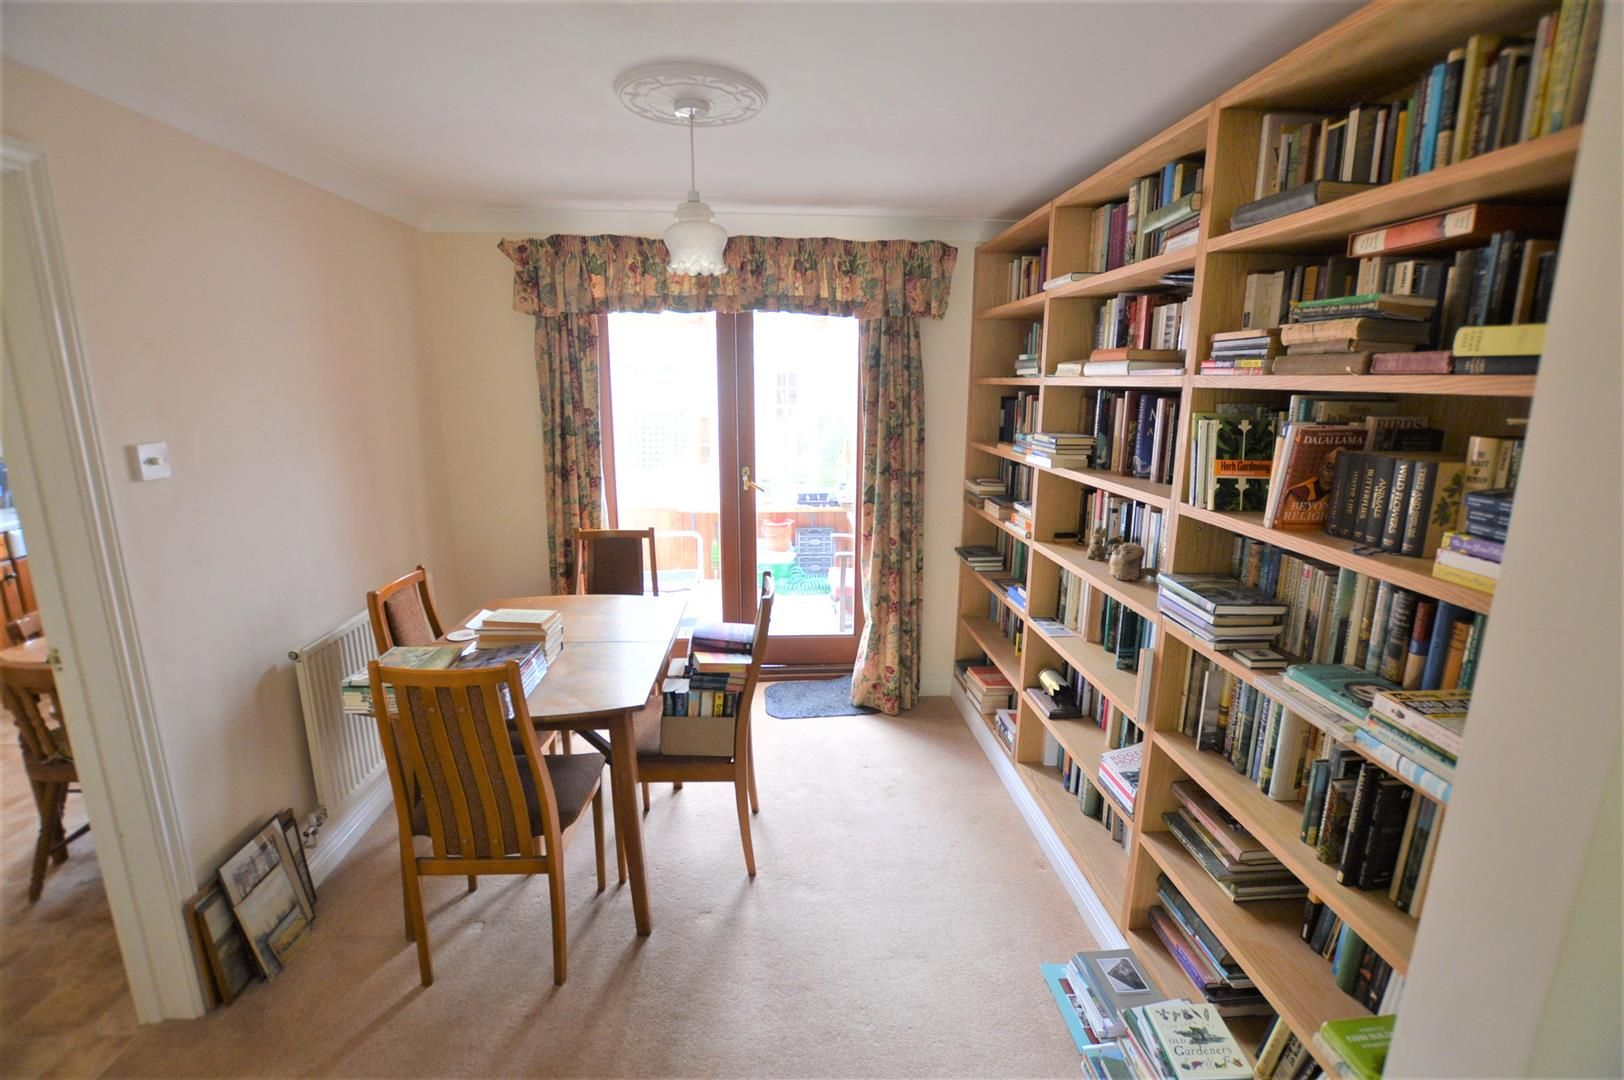 3 bed terraced for sale in Eardisley  - Property Image 4